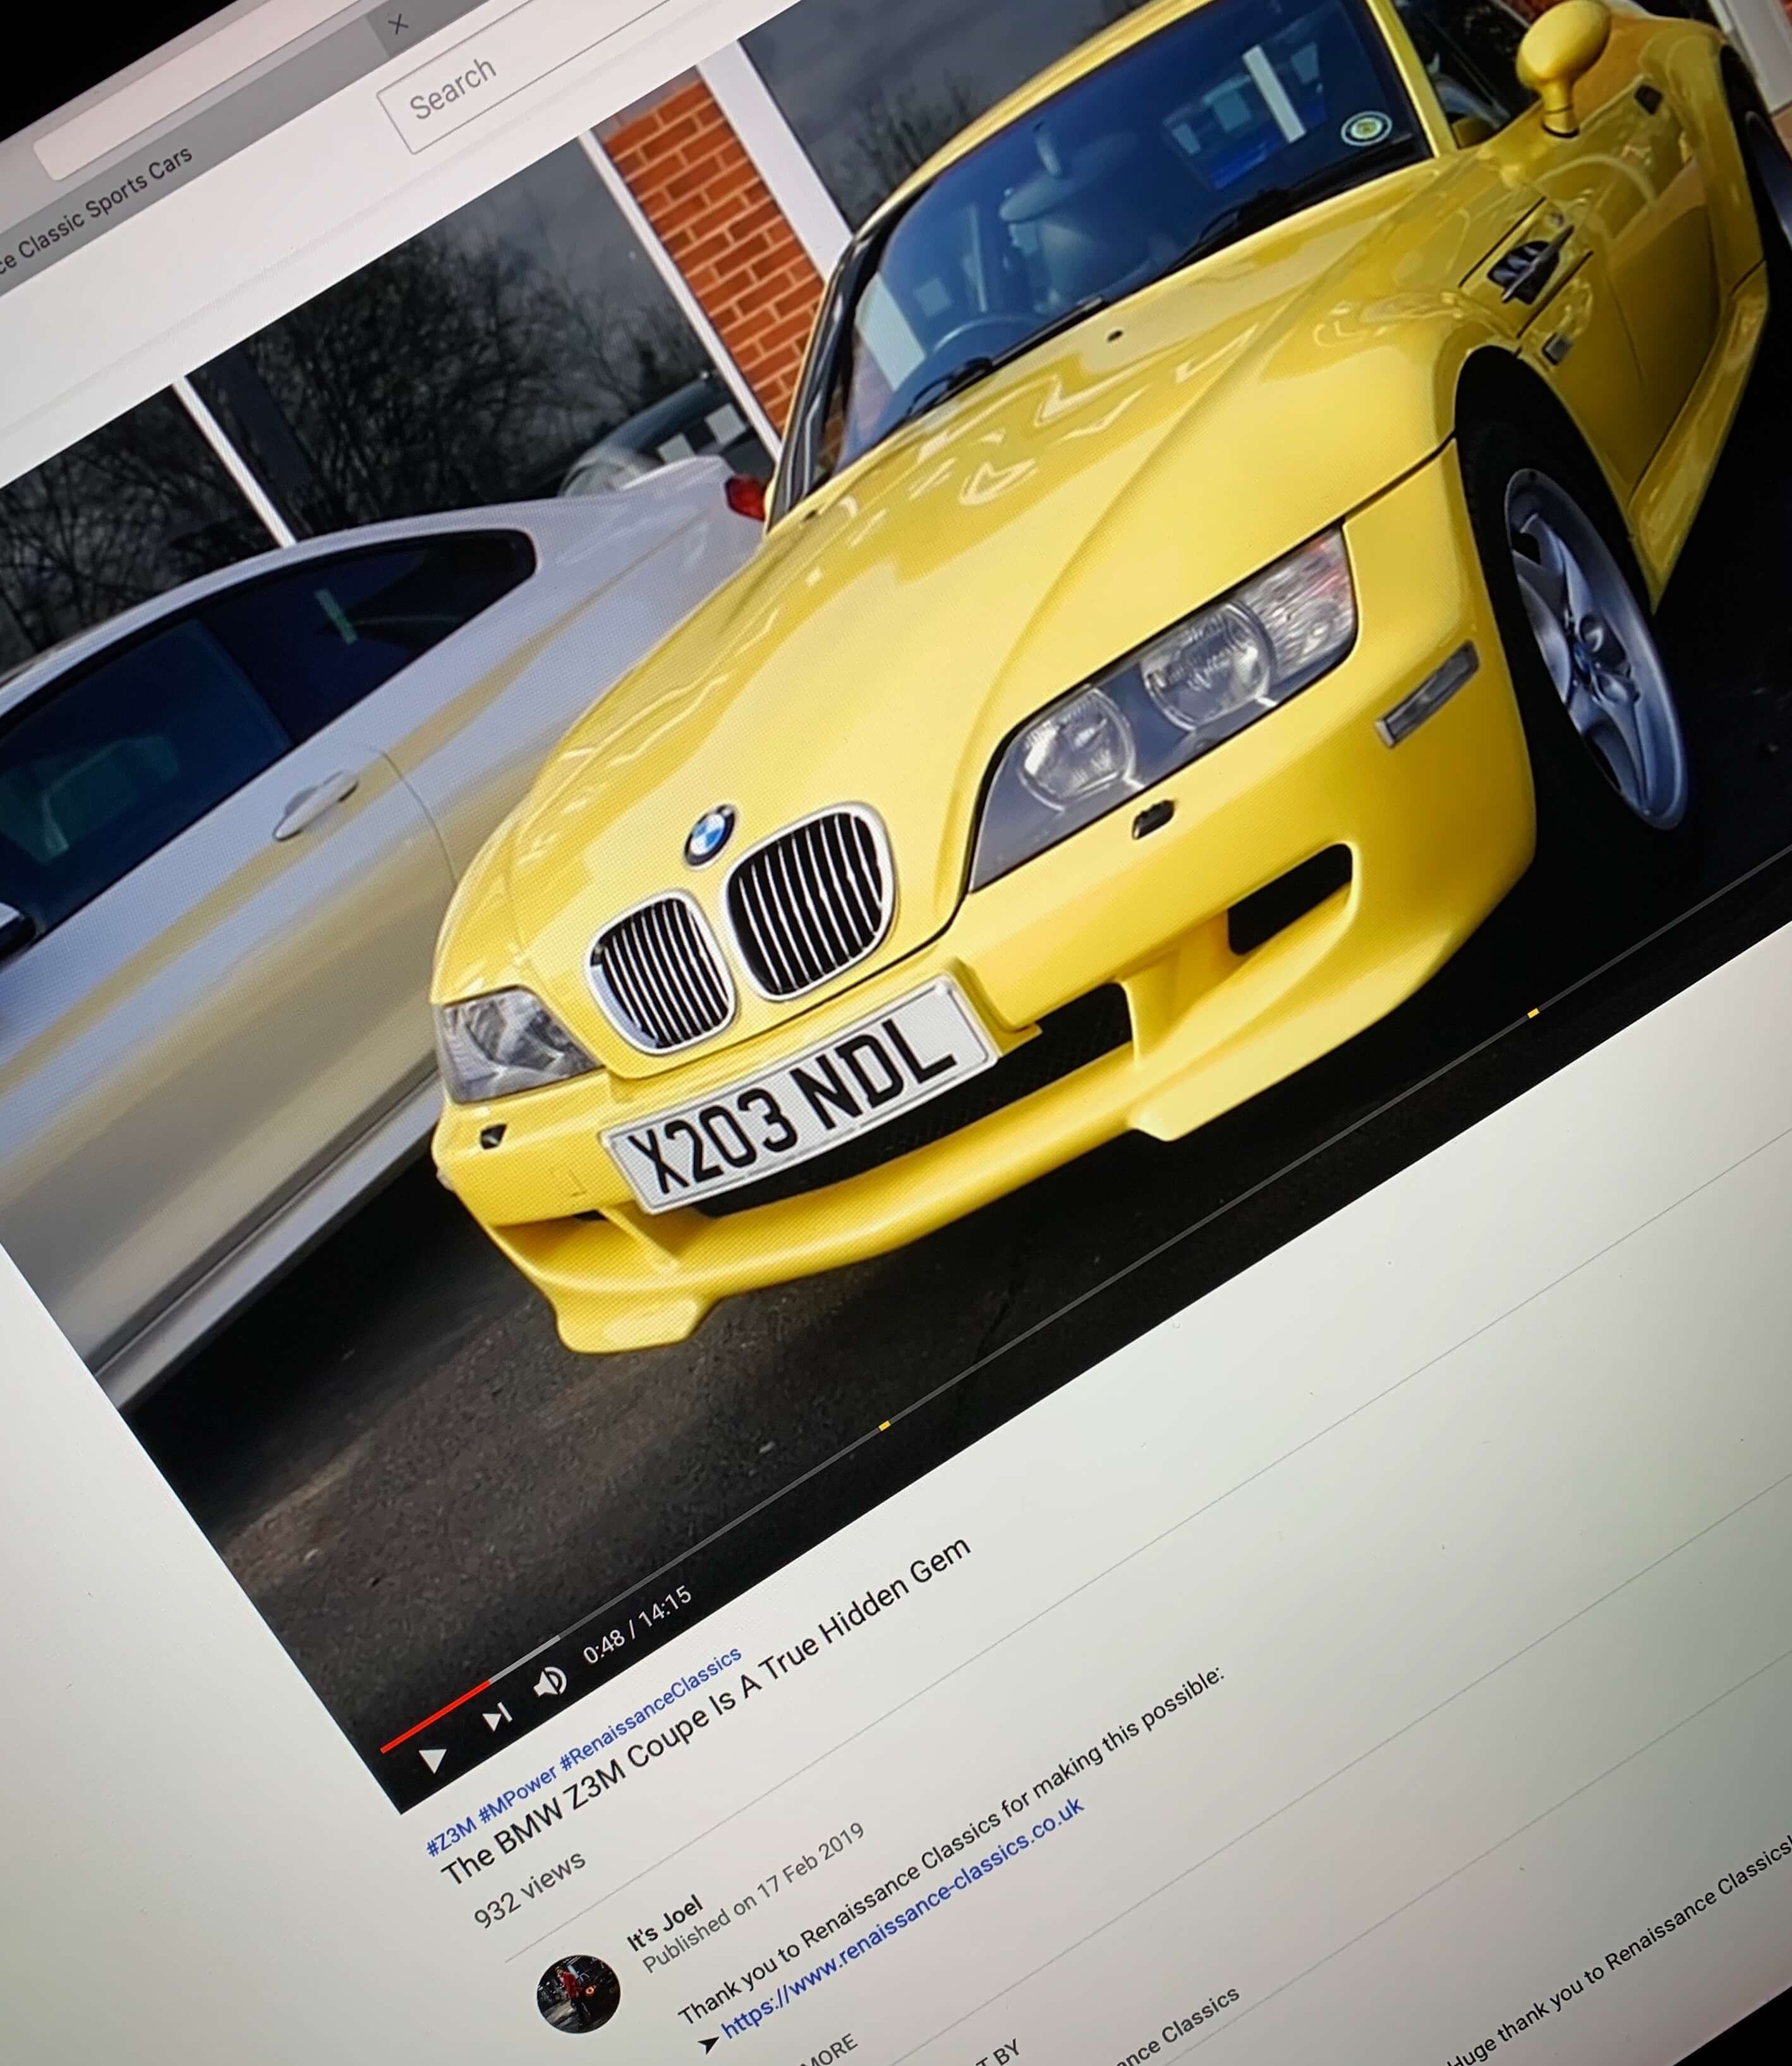 THE BMW Z3M COUPE IS A TRUE HIDDEN GEM